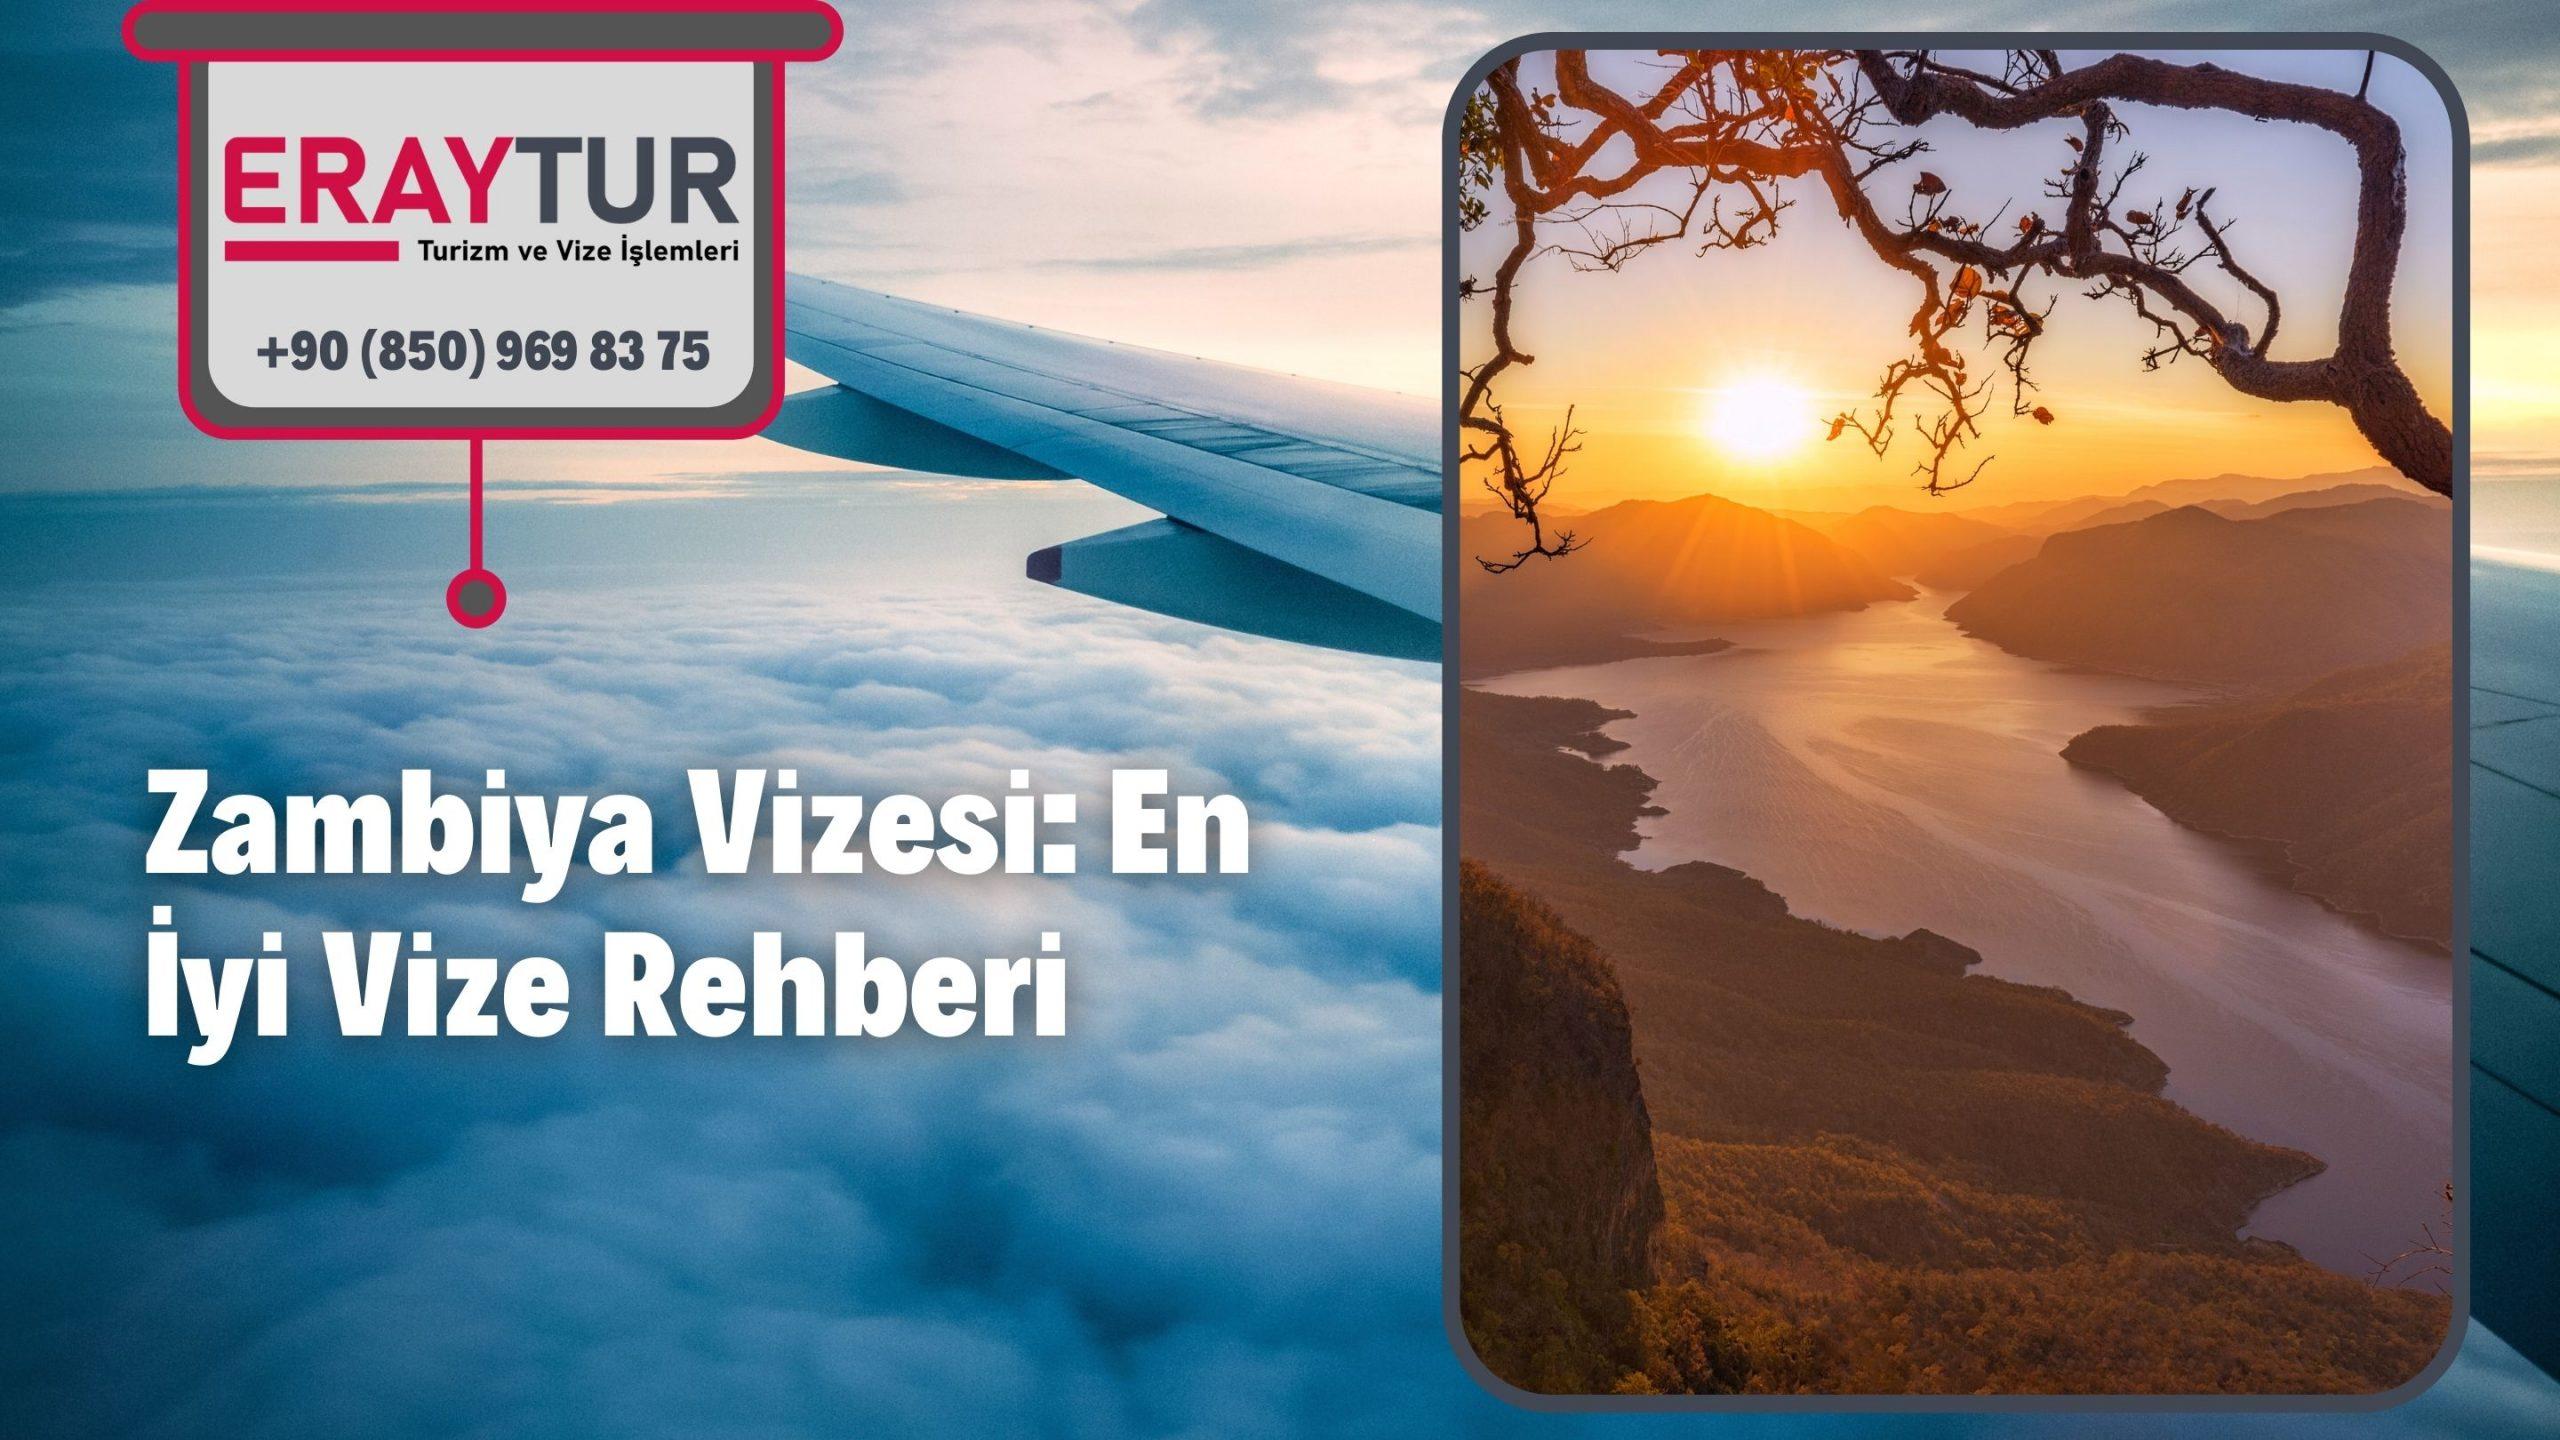 Zambiya Vizesi: En İyi Vize Rehberi 2021 1 – zambiya vizesi en iyi vize rehberi 2021 1 scaled